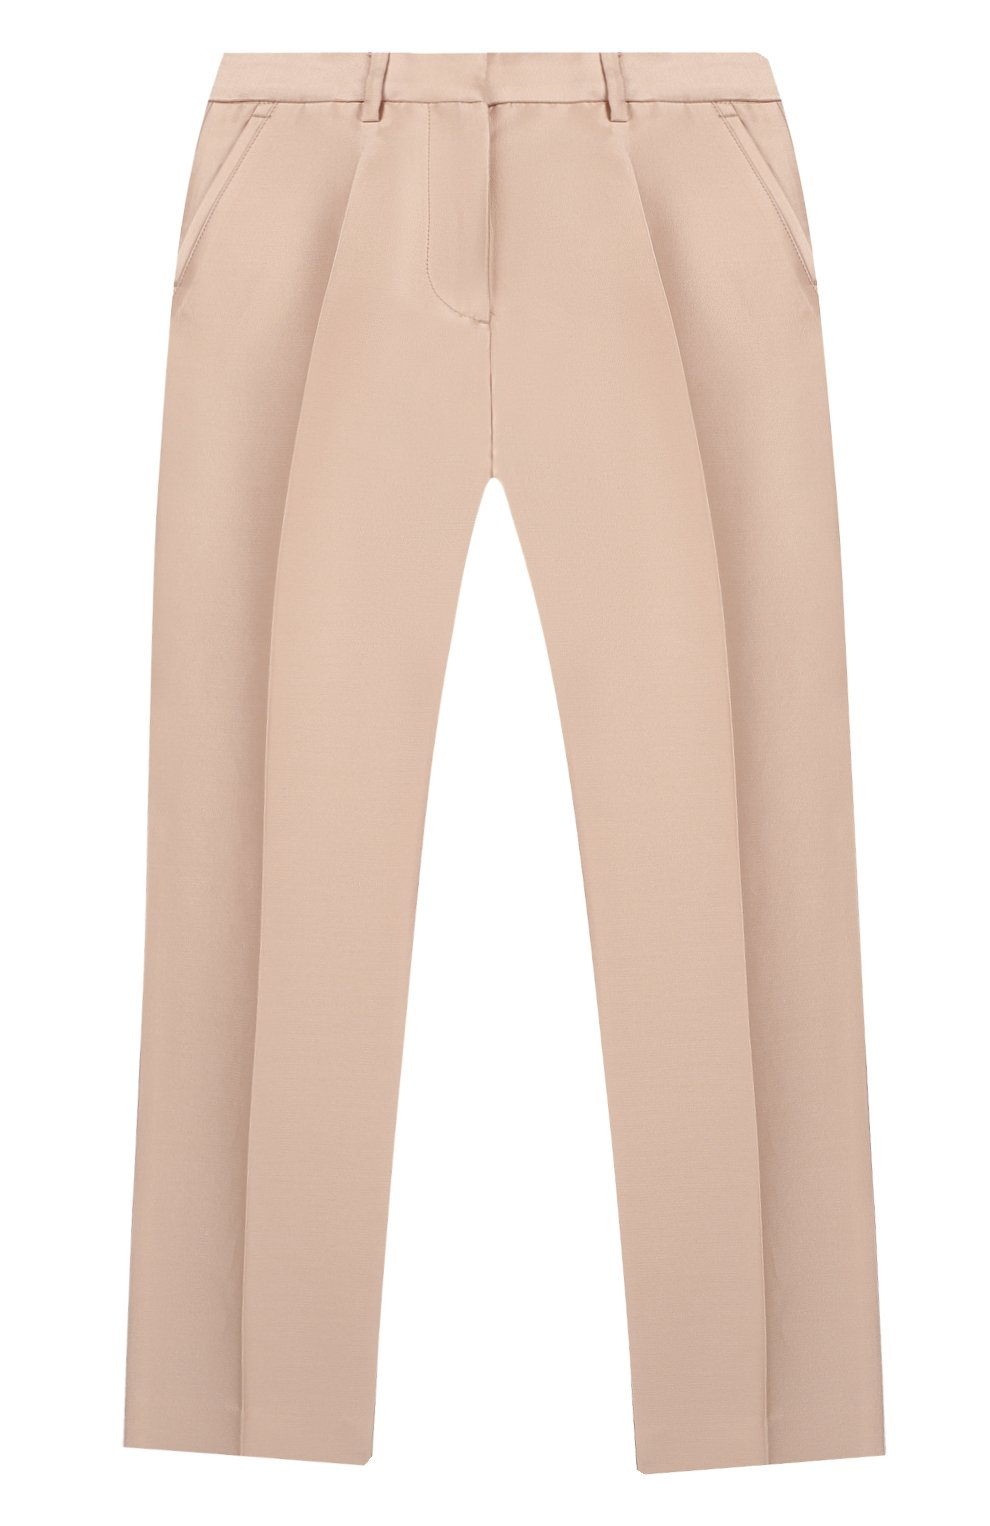 Детский костюм из жакета и брюк STELLA MCCARTNEY светло-розового цвета, арт. 600183/S0KF1 | Фото 5